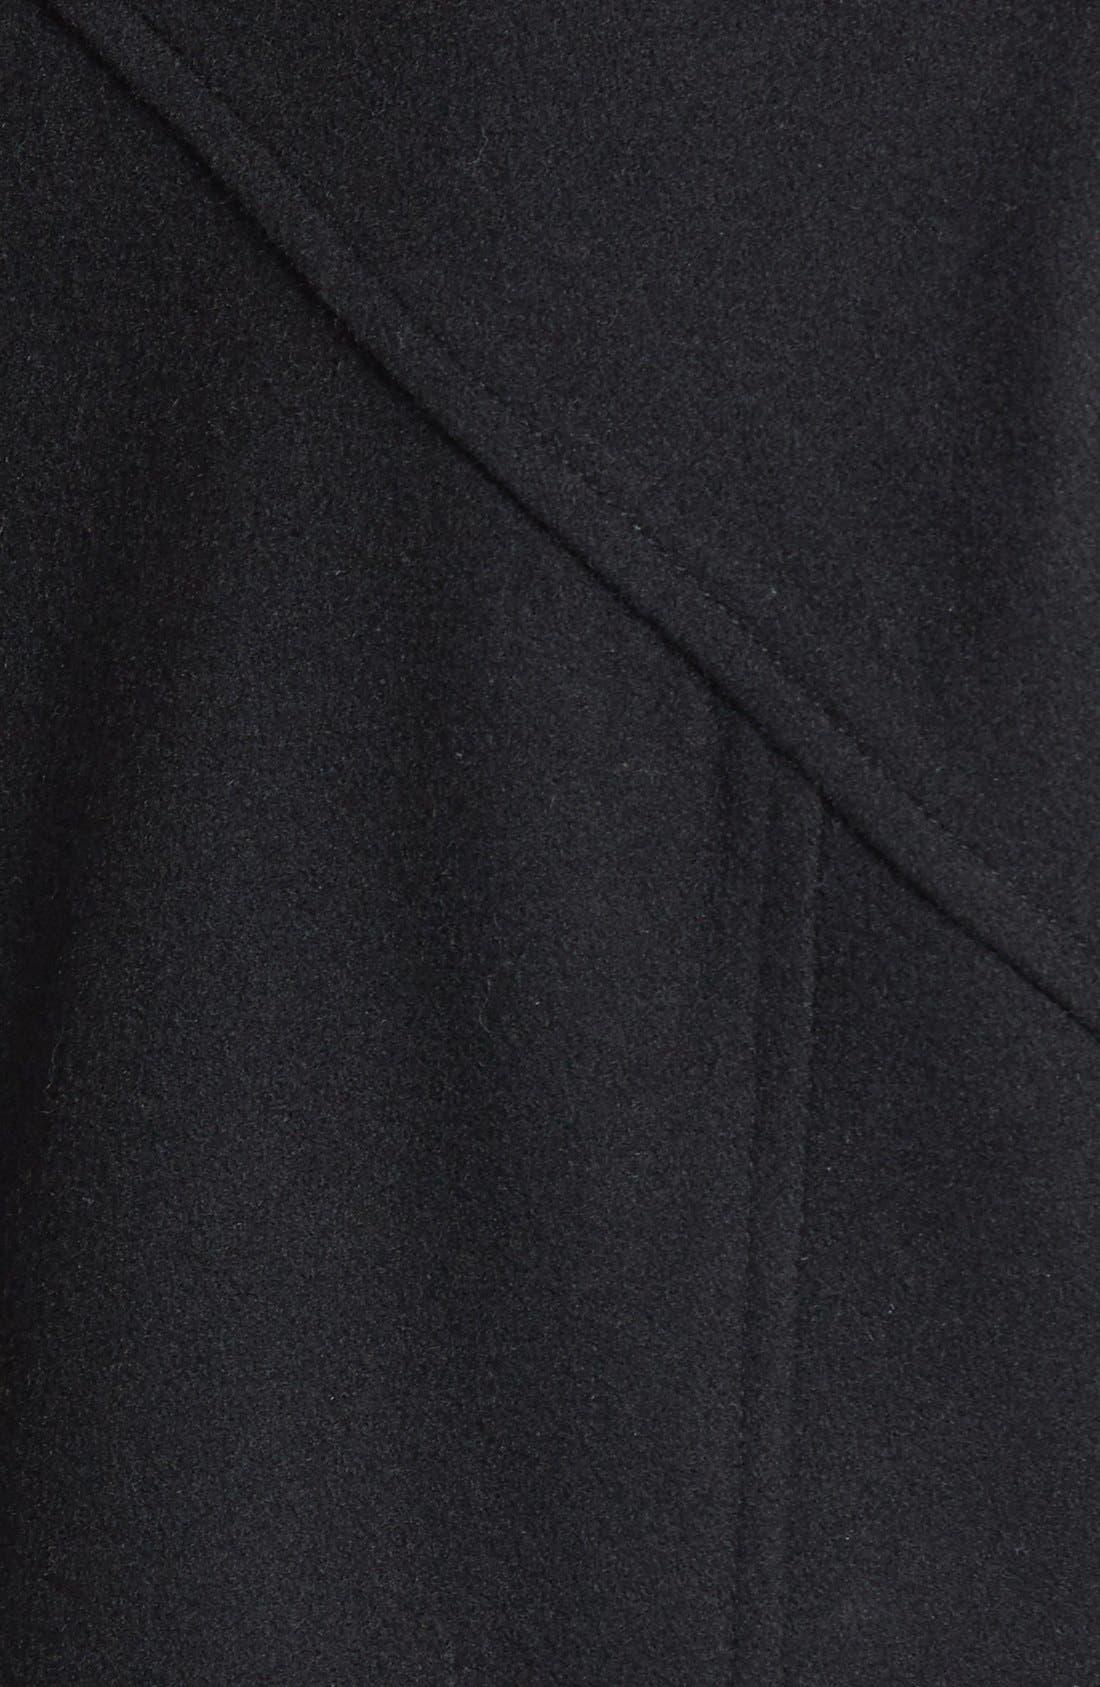 SAM EDELMAN,                             'Fallon' Faux Leather Trim Asymmetrical Wool Blend Coat,                             Alternate thumbnail 3, color,                             001